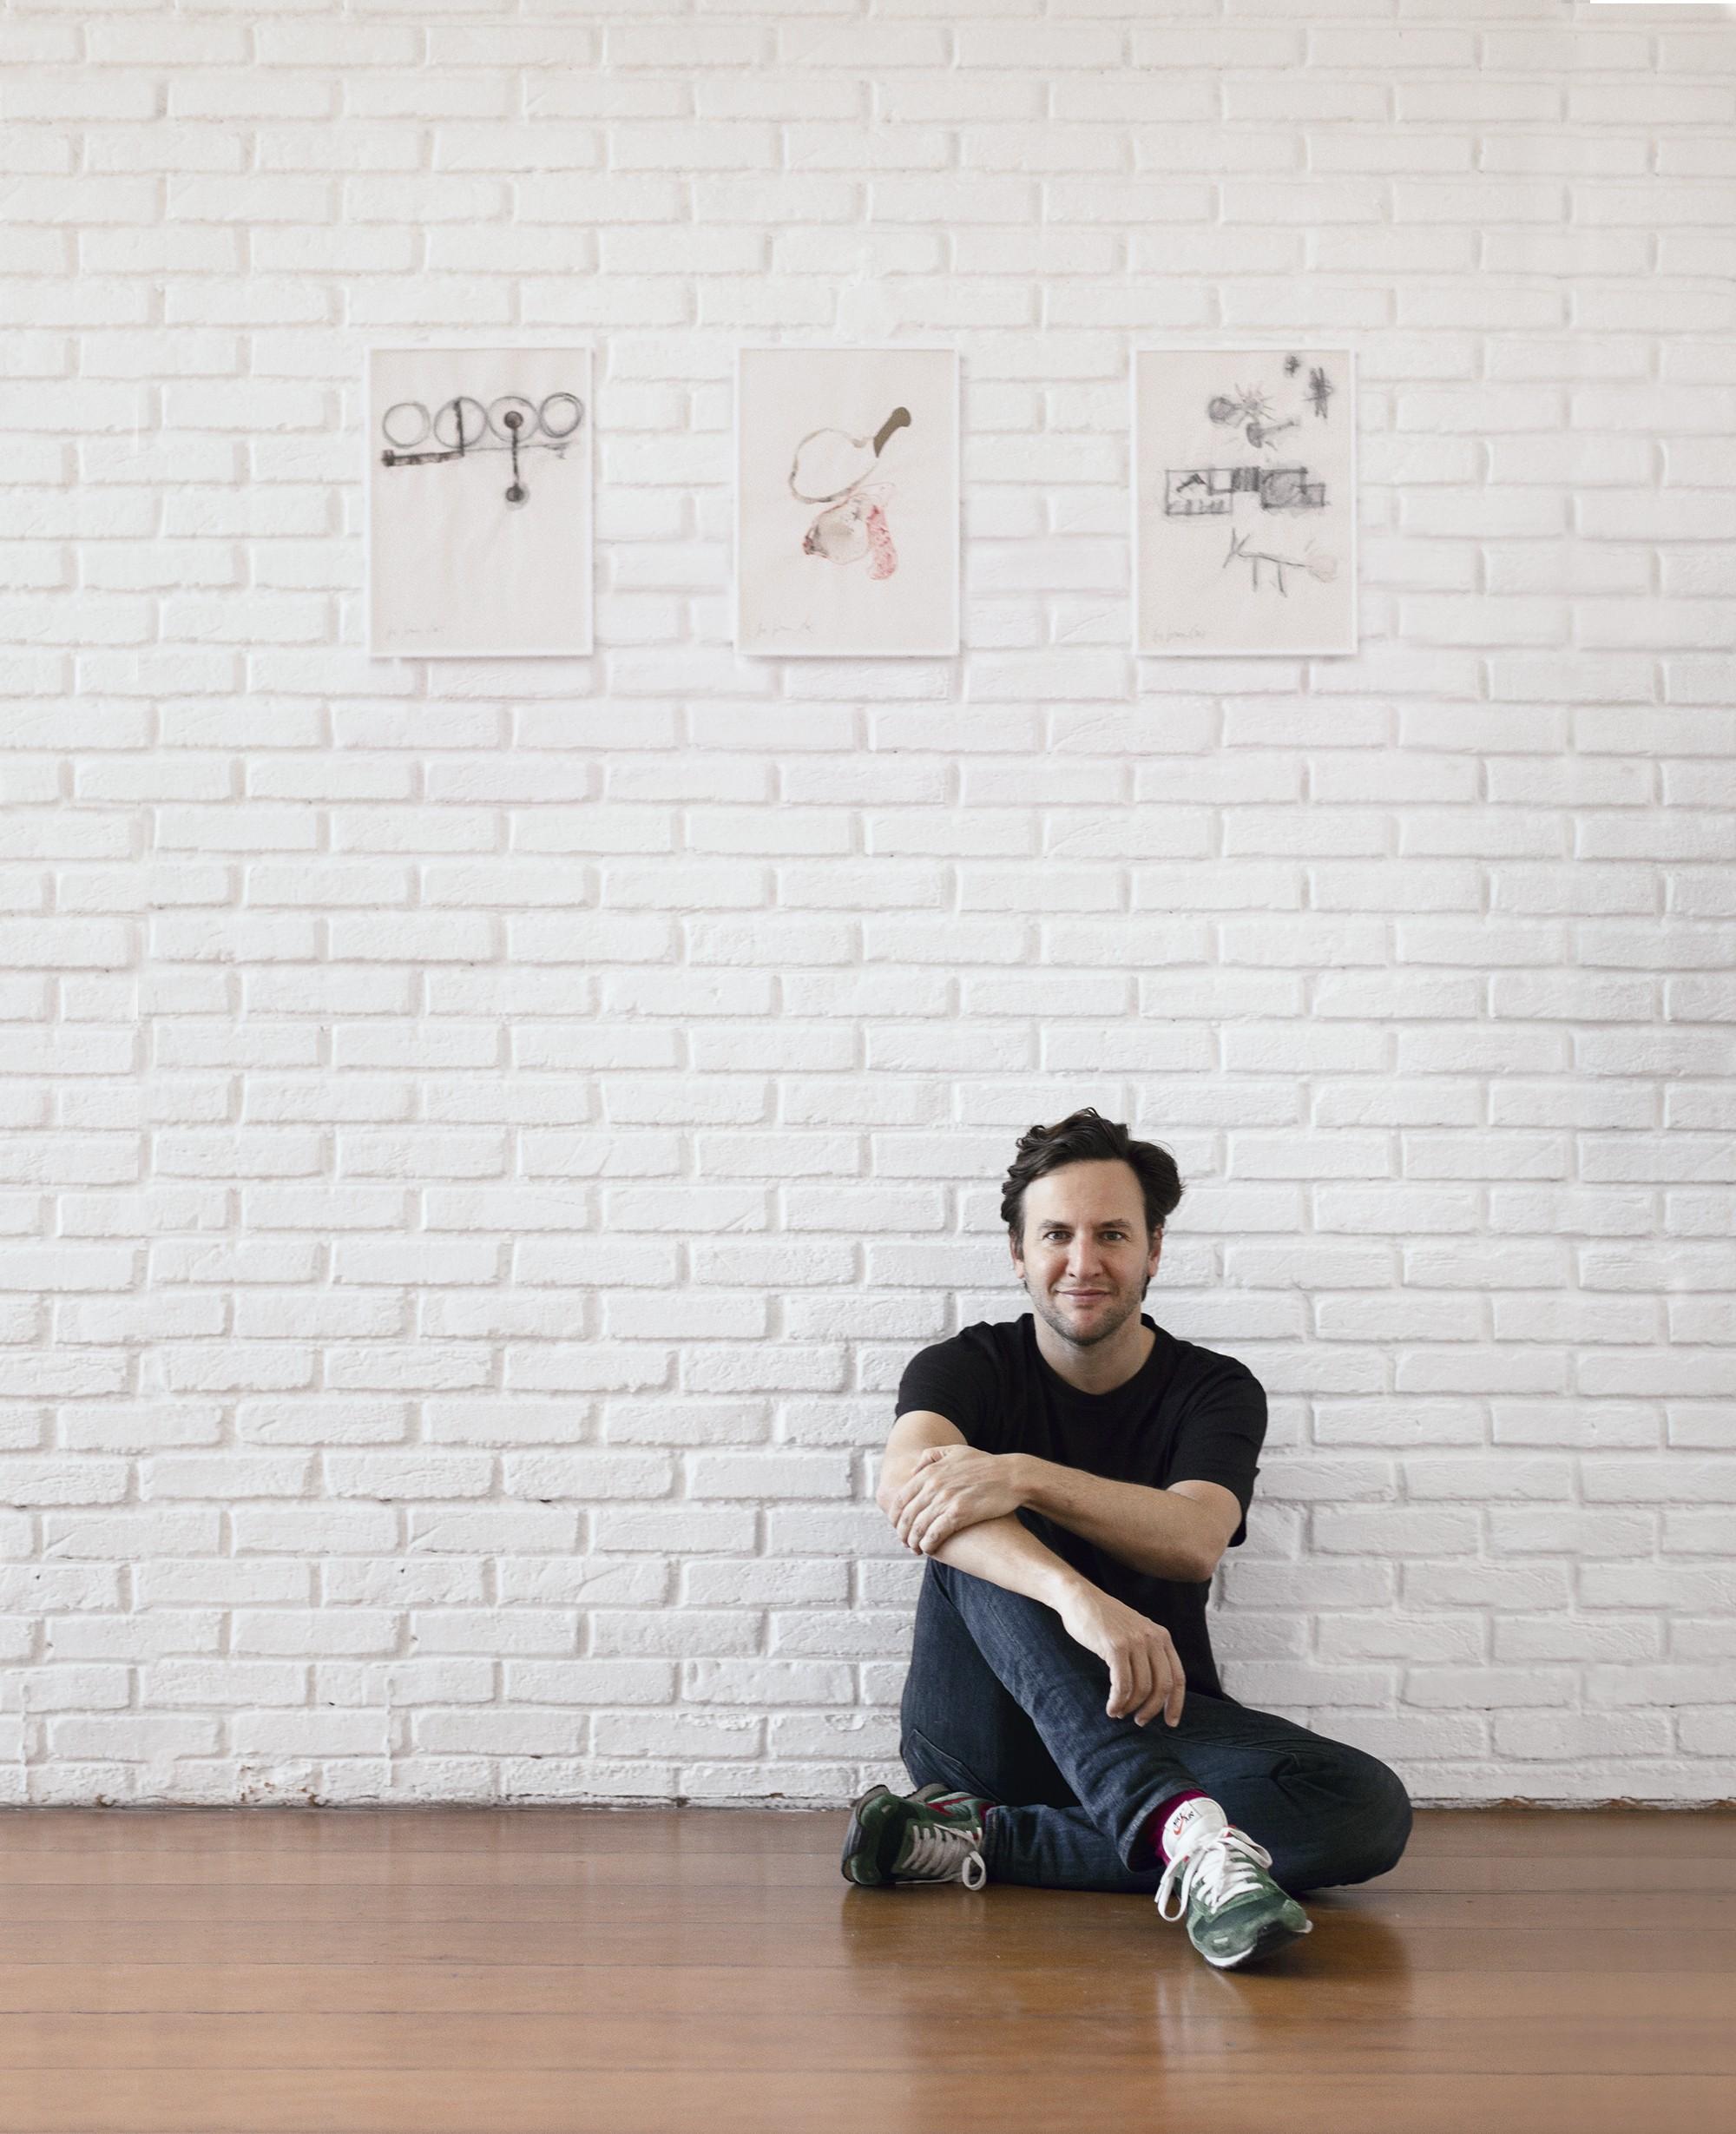 Ricardo Kugelmas posa com as obras de Antonio Dias (Foto: Rafael Jacinto)